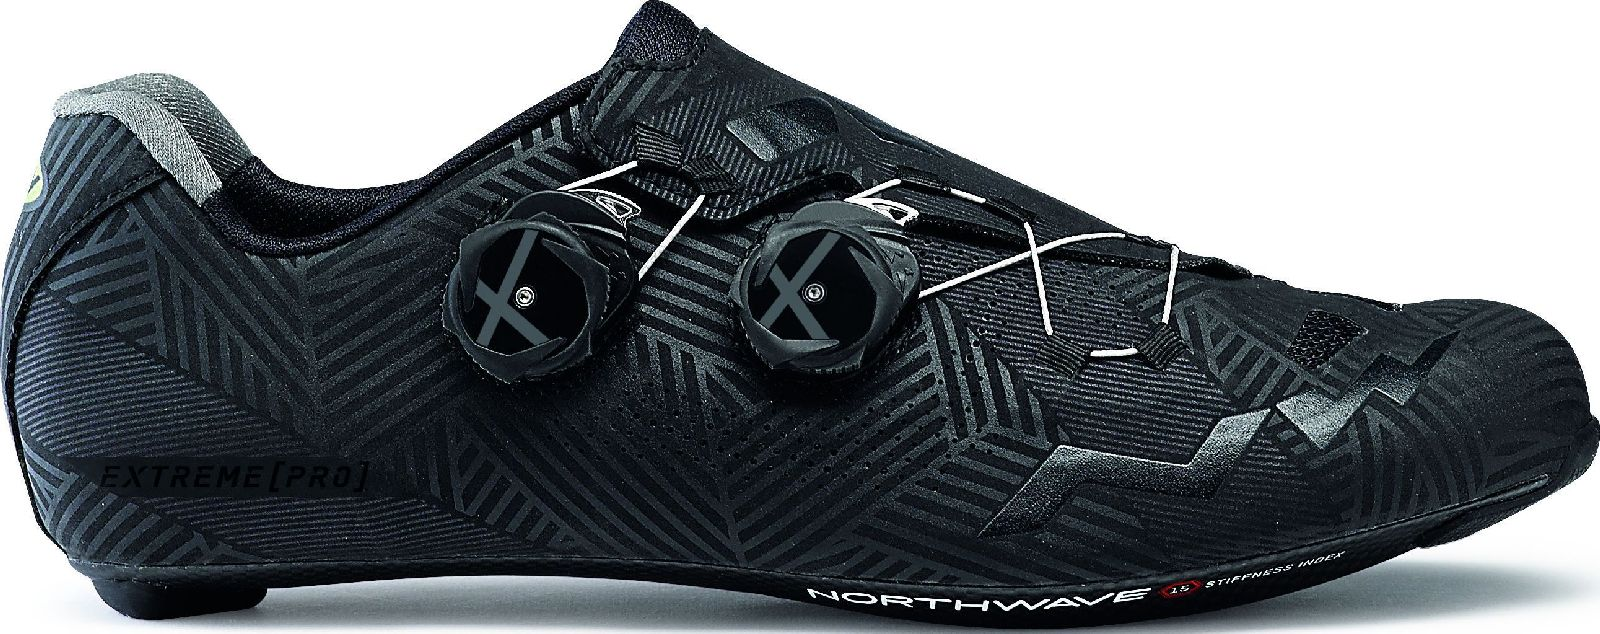 Northwave Extreme Pro - black 44.5